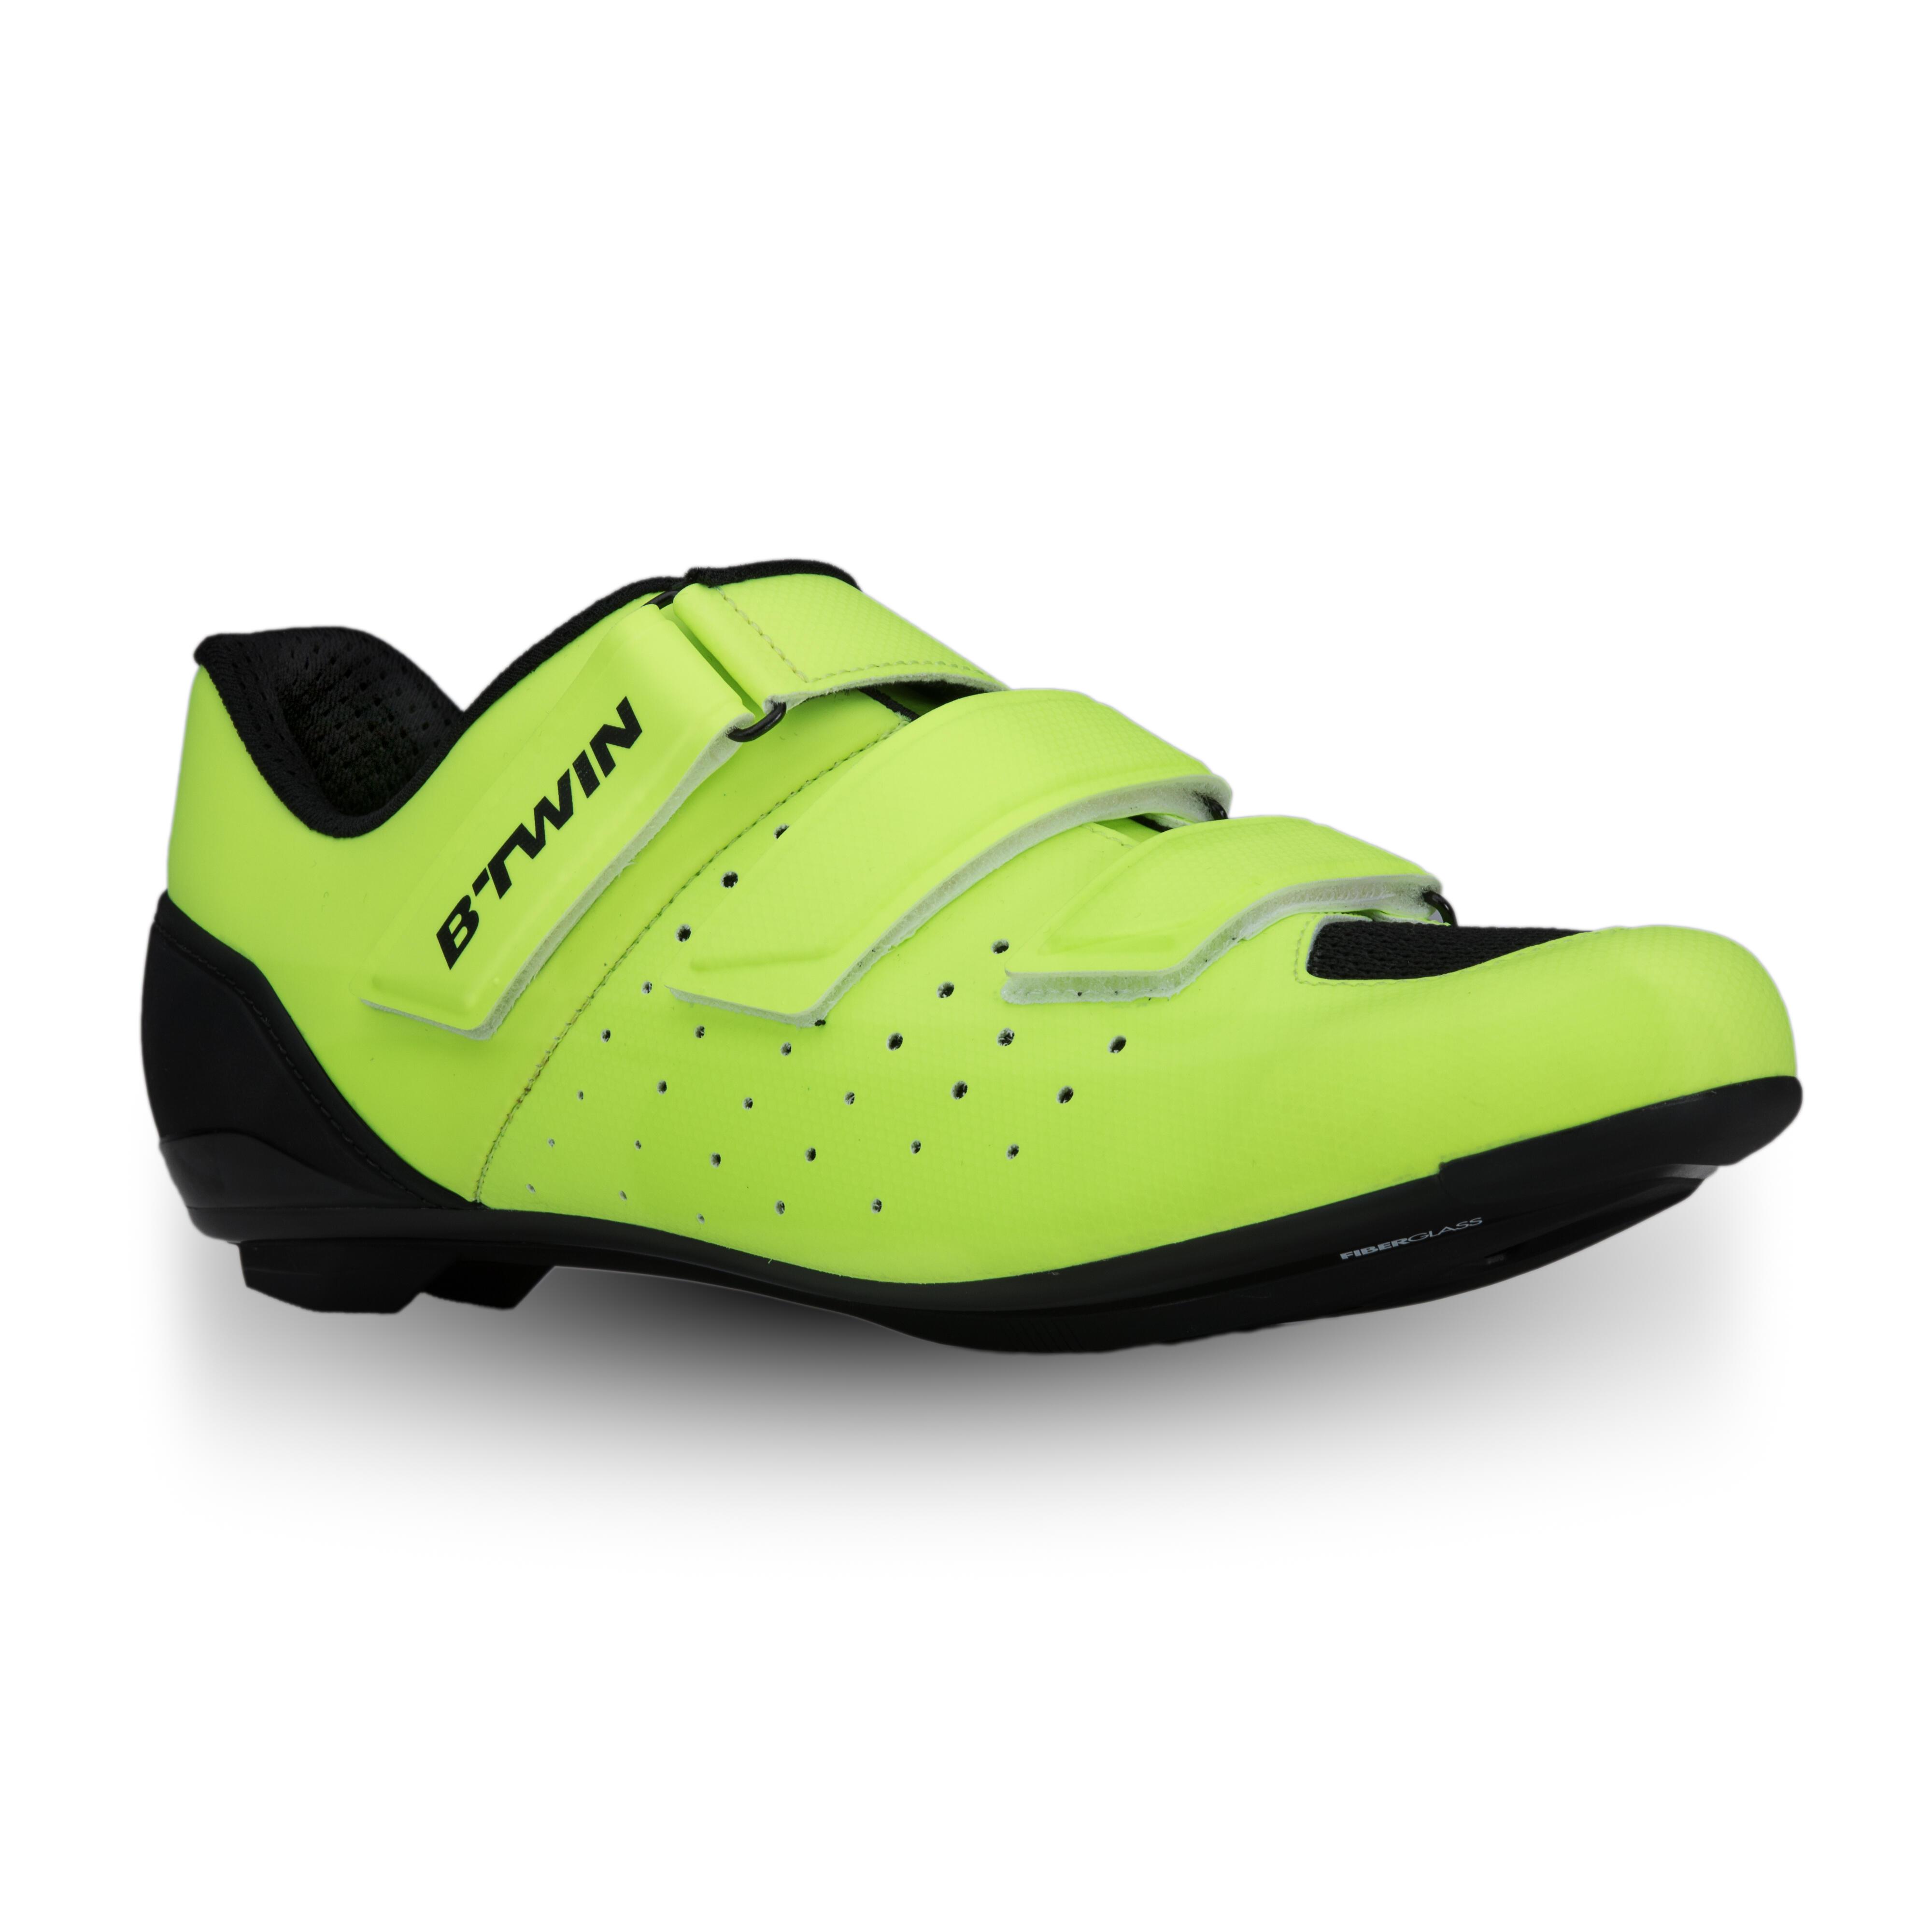 Fahrradschuhe Rennrad 500 neongelb | Schuhe > Sportschuhe > Fahrradschuhe | Gelb | B´twin